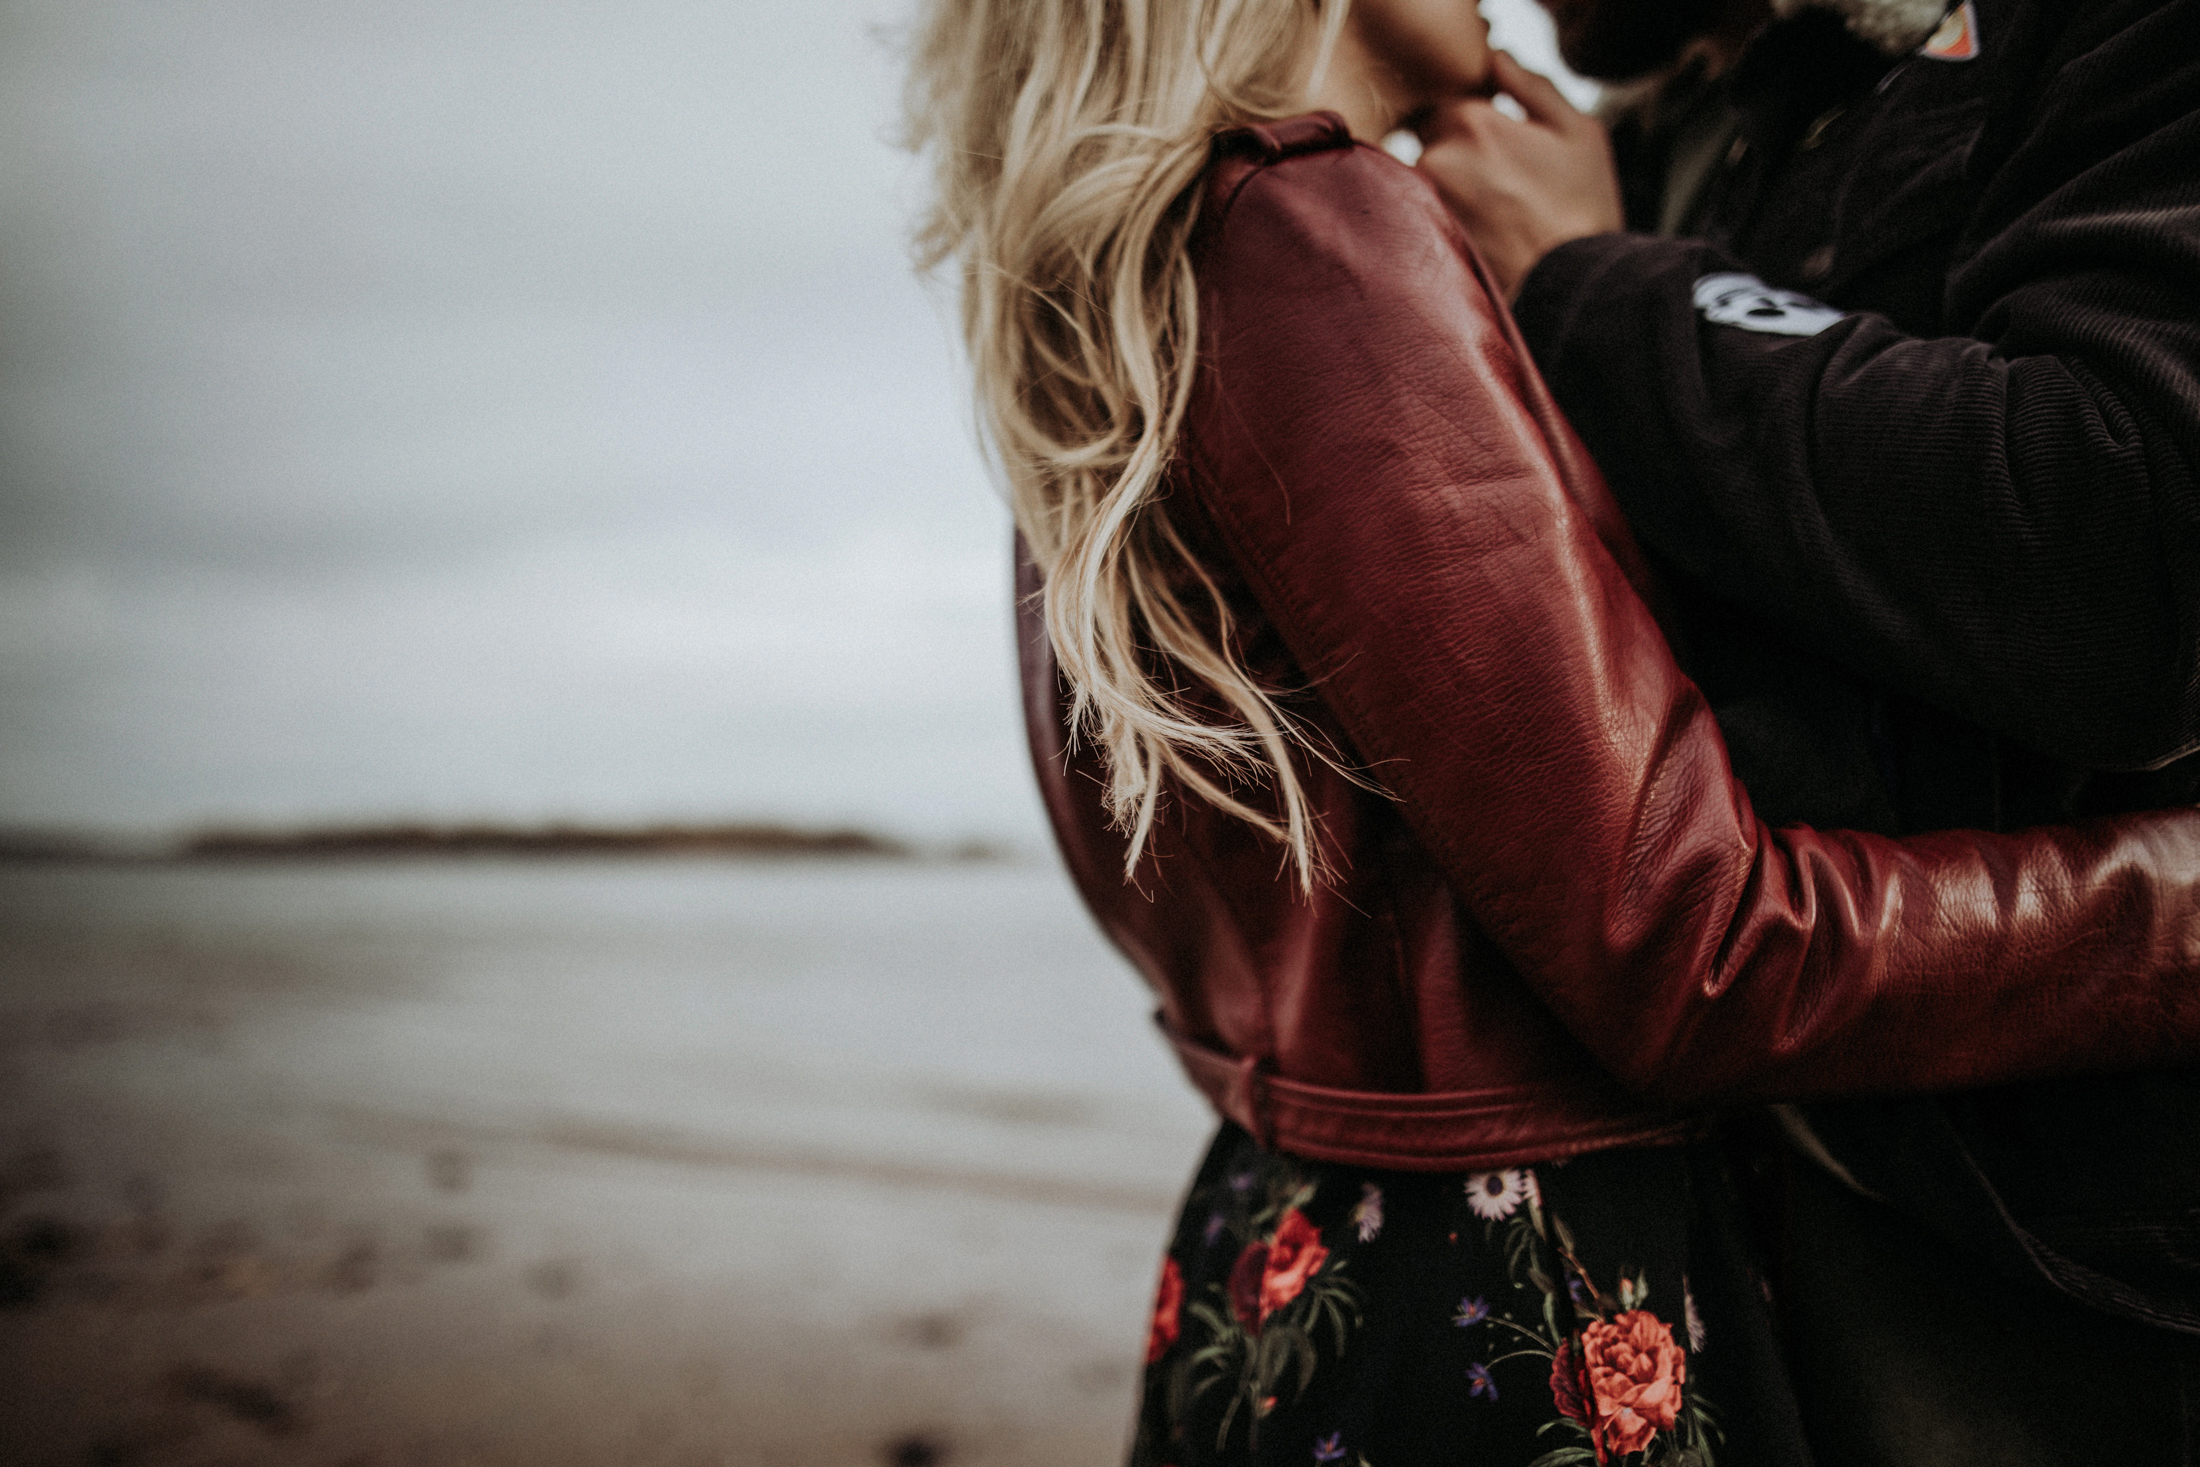 Wedding_Photographer_Mallorca_DanielaMarquardt_Photography_CanaryIslands_Lanzarote_Iceland_Tuscany_Santorini_Portugal_NewYork_Spain_Elopement_Hochzeitsfotograf_CK70